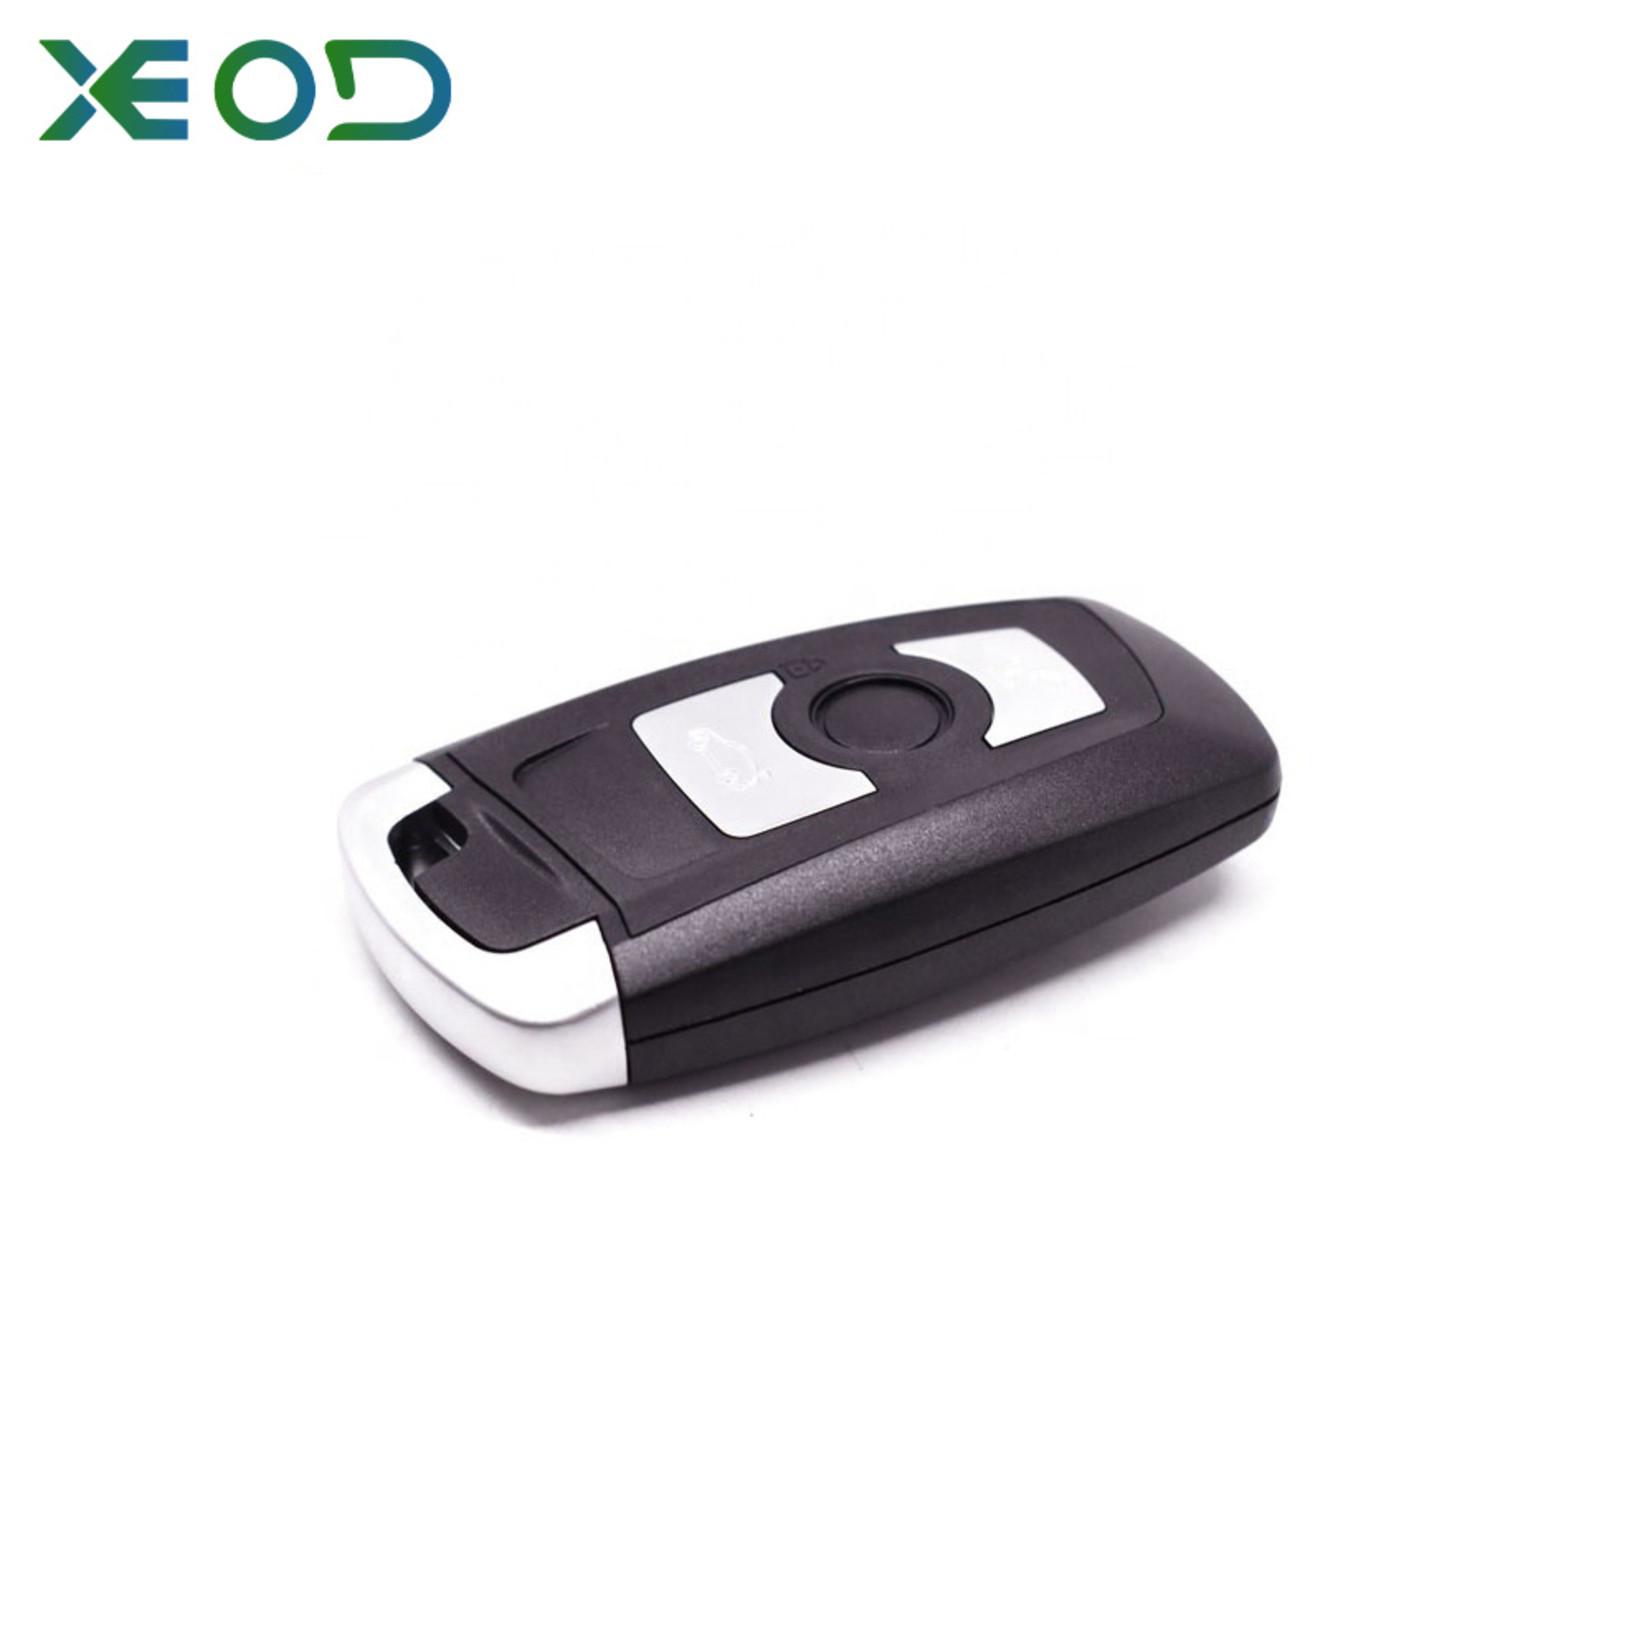 XEOD BMW 3-Knops smart sleutelbehuizing